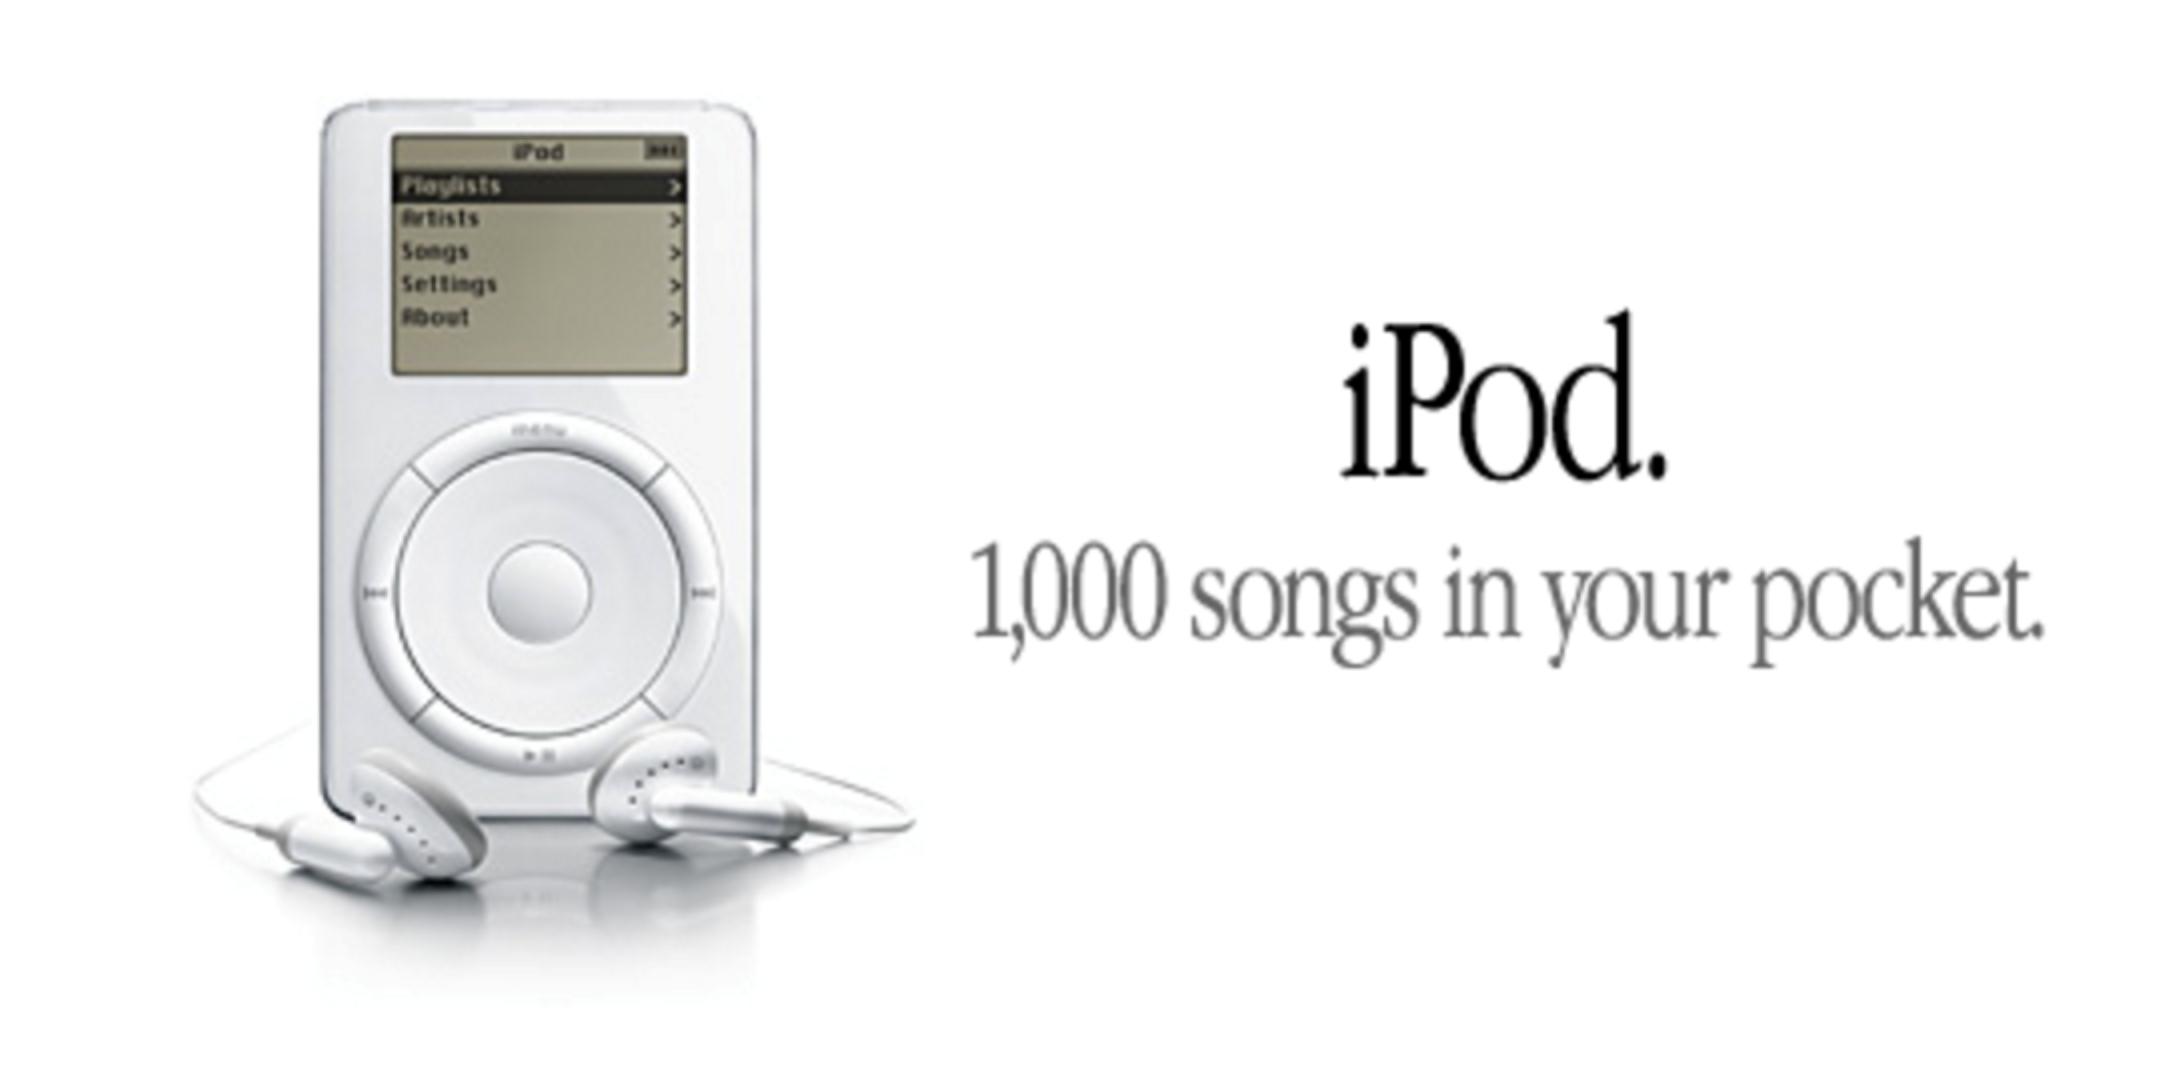 ipod-content-marketing-impulse.png